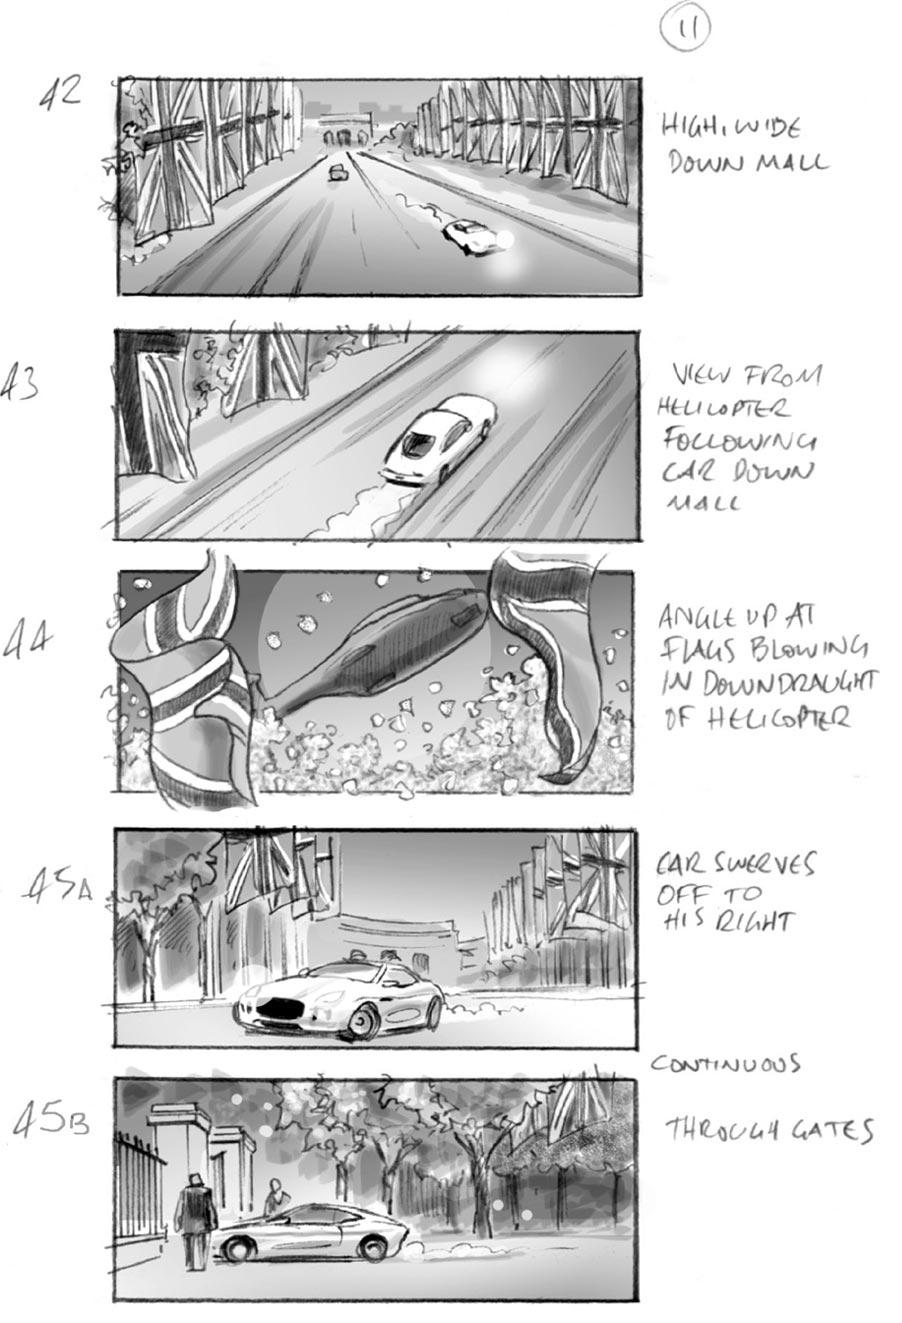 jaguar car commercial by storyboard artist by douglas ingram